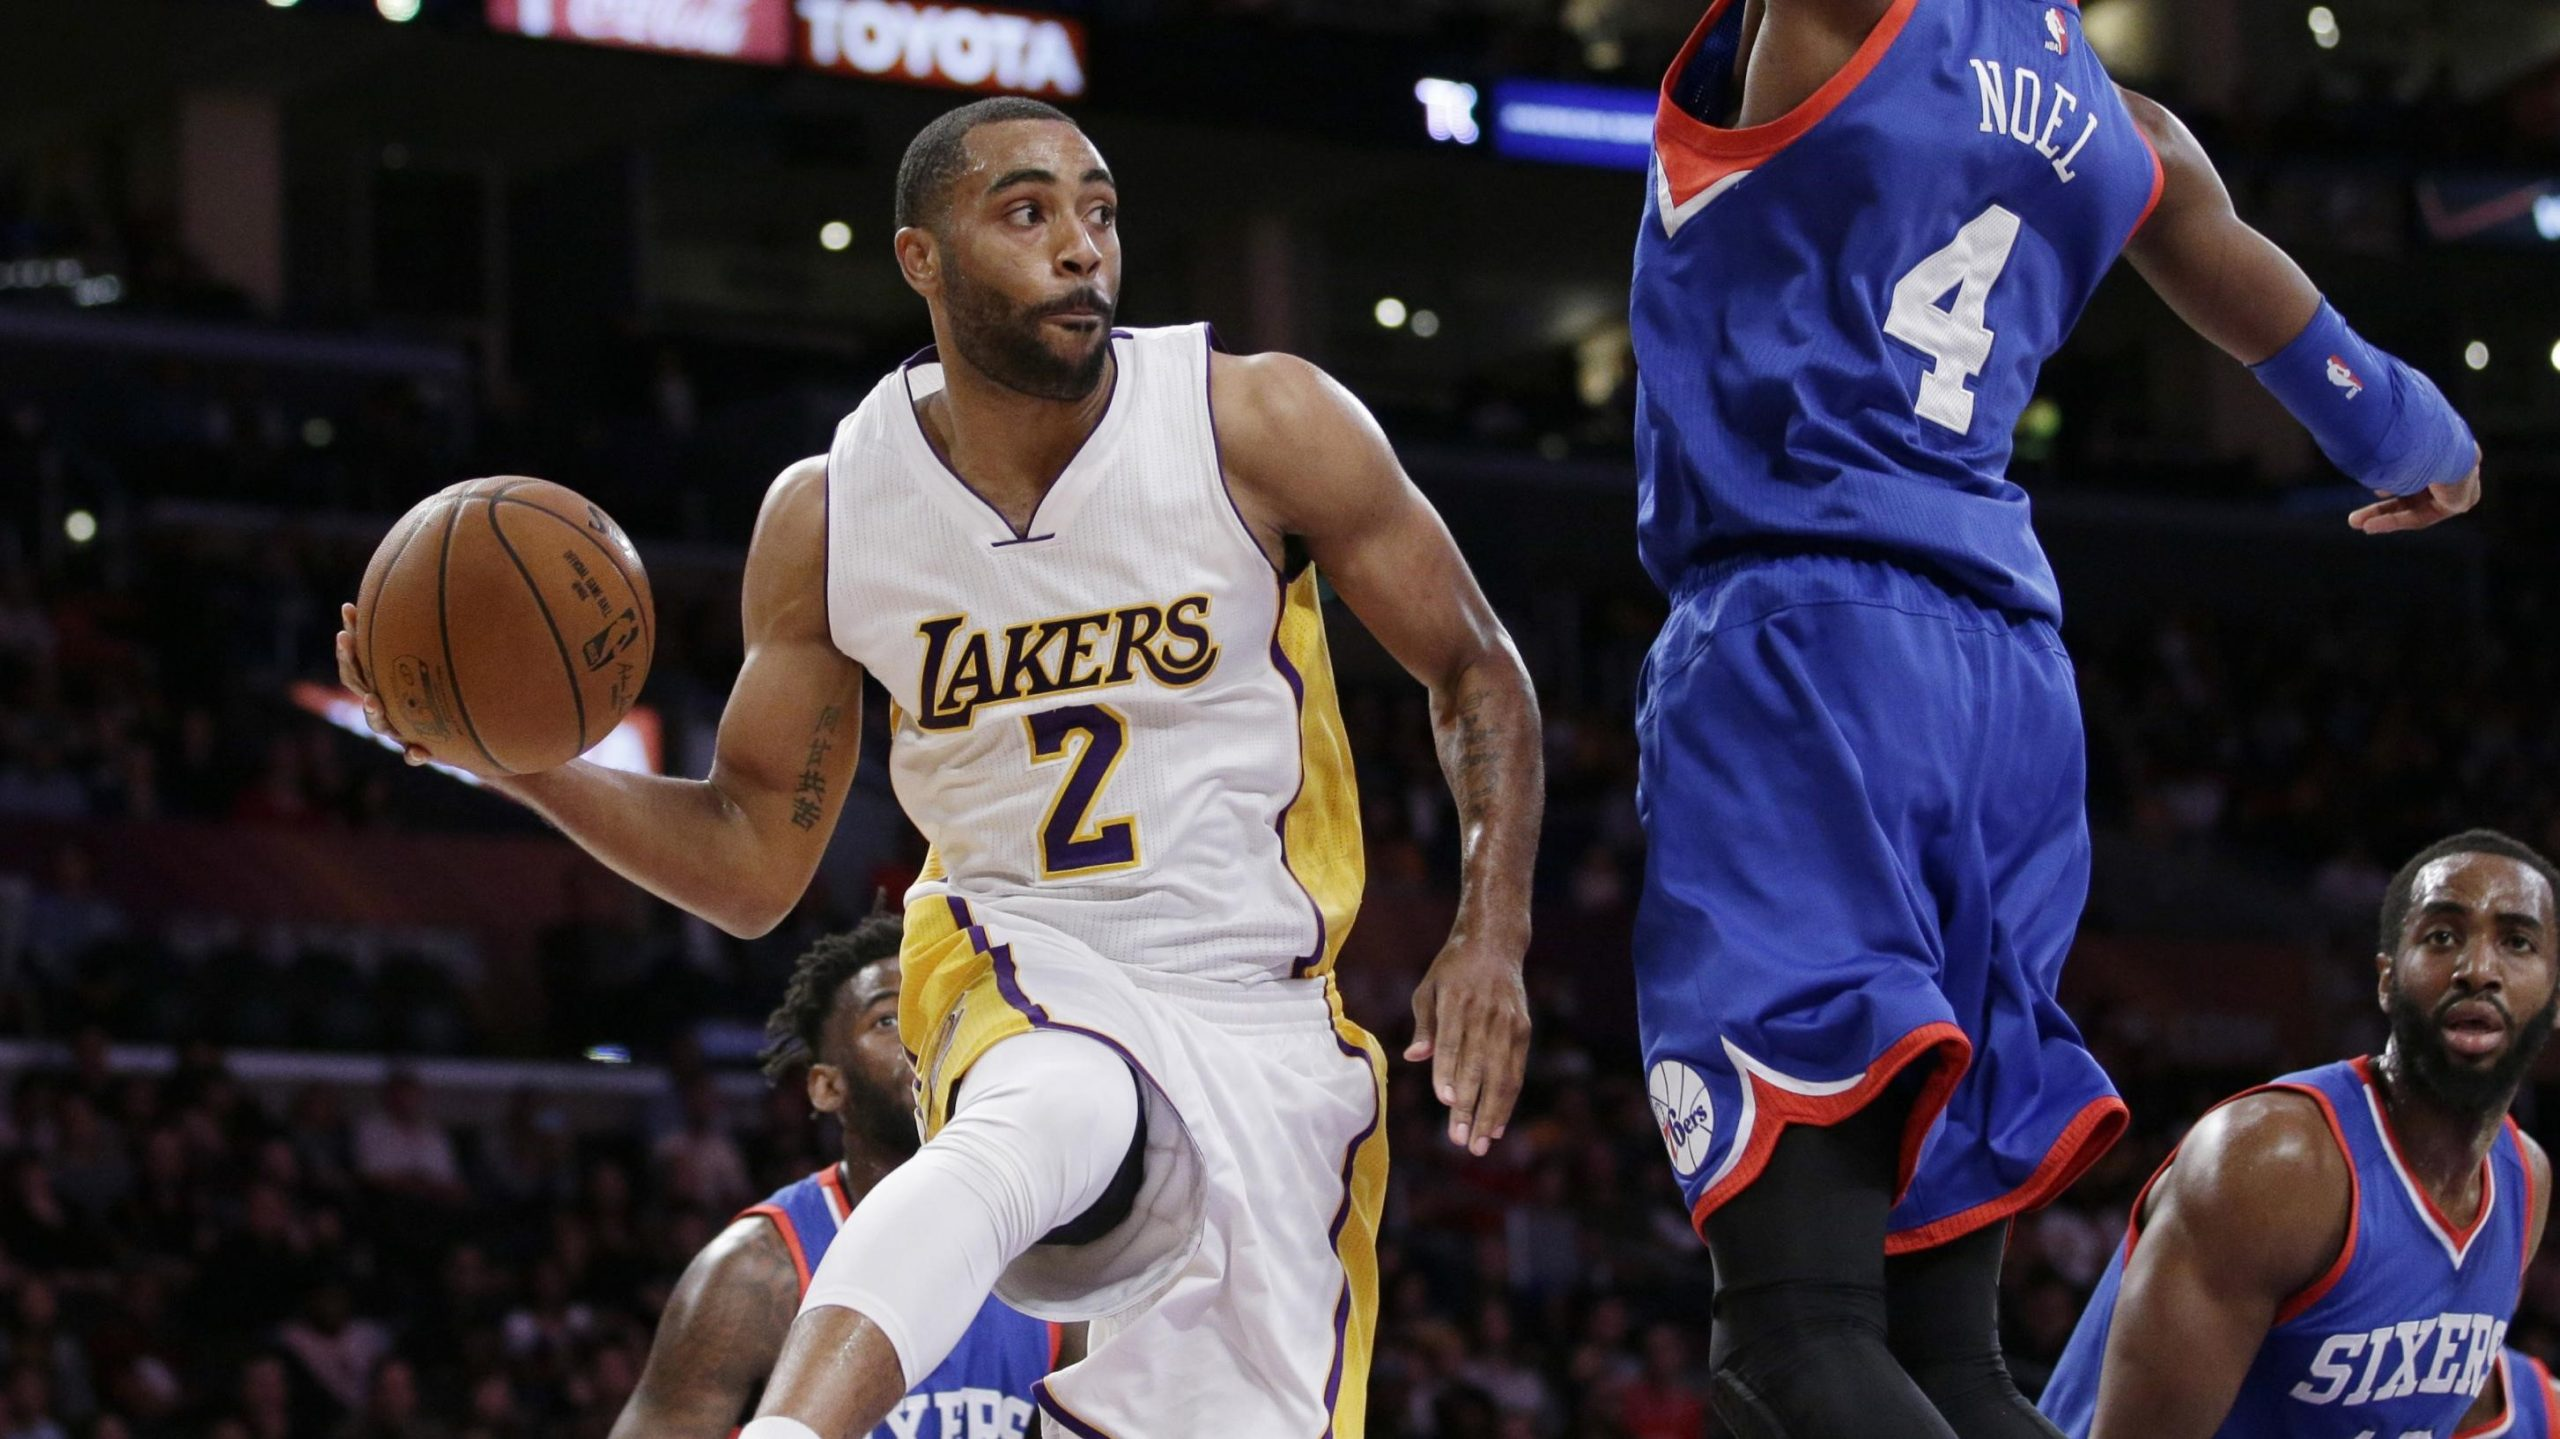 NBA guardia Lakers